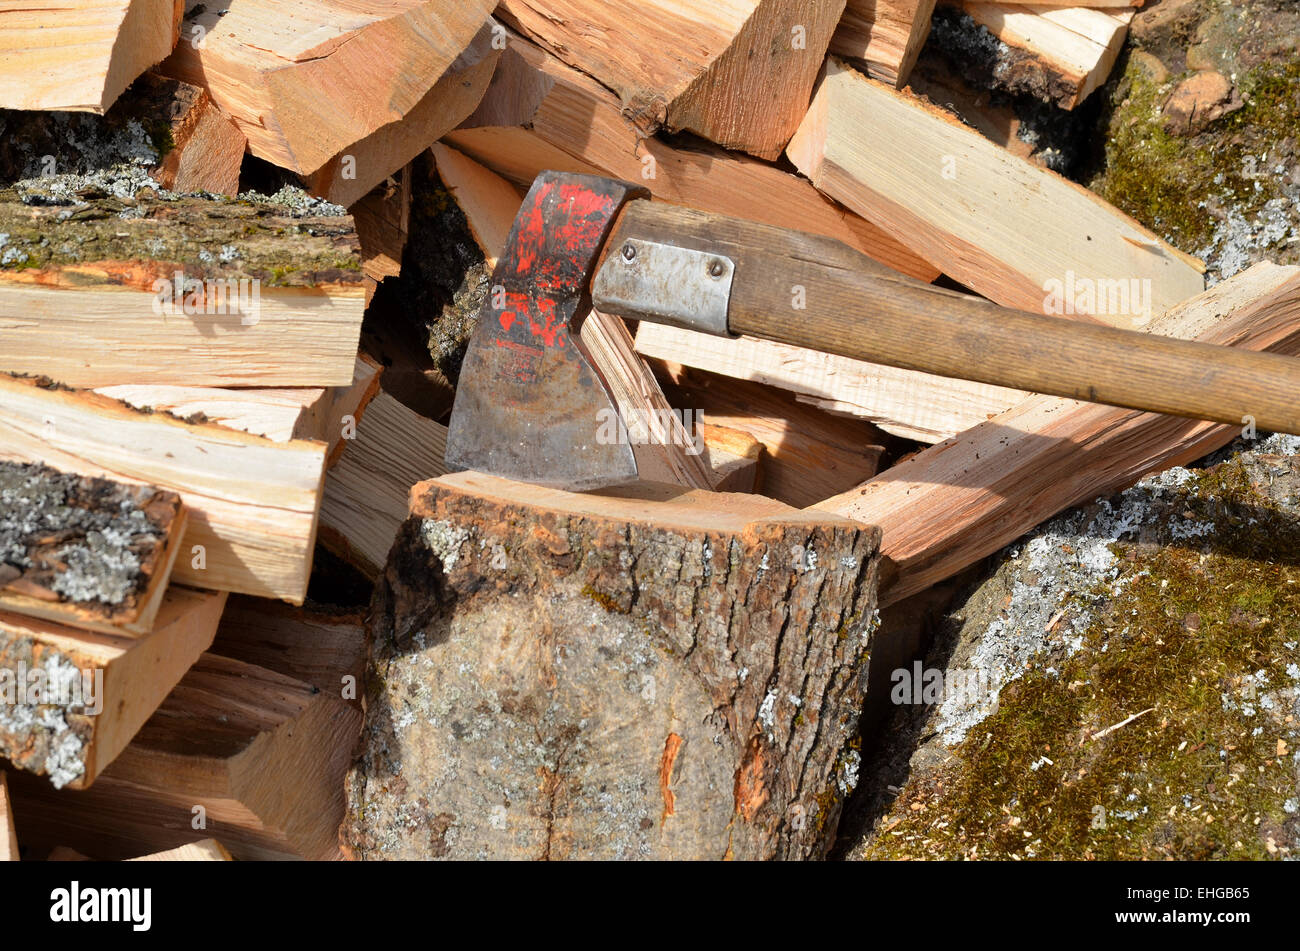 Hardwood wood fire ax - Stock Image